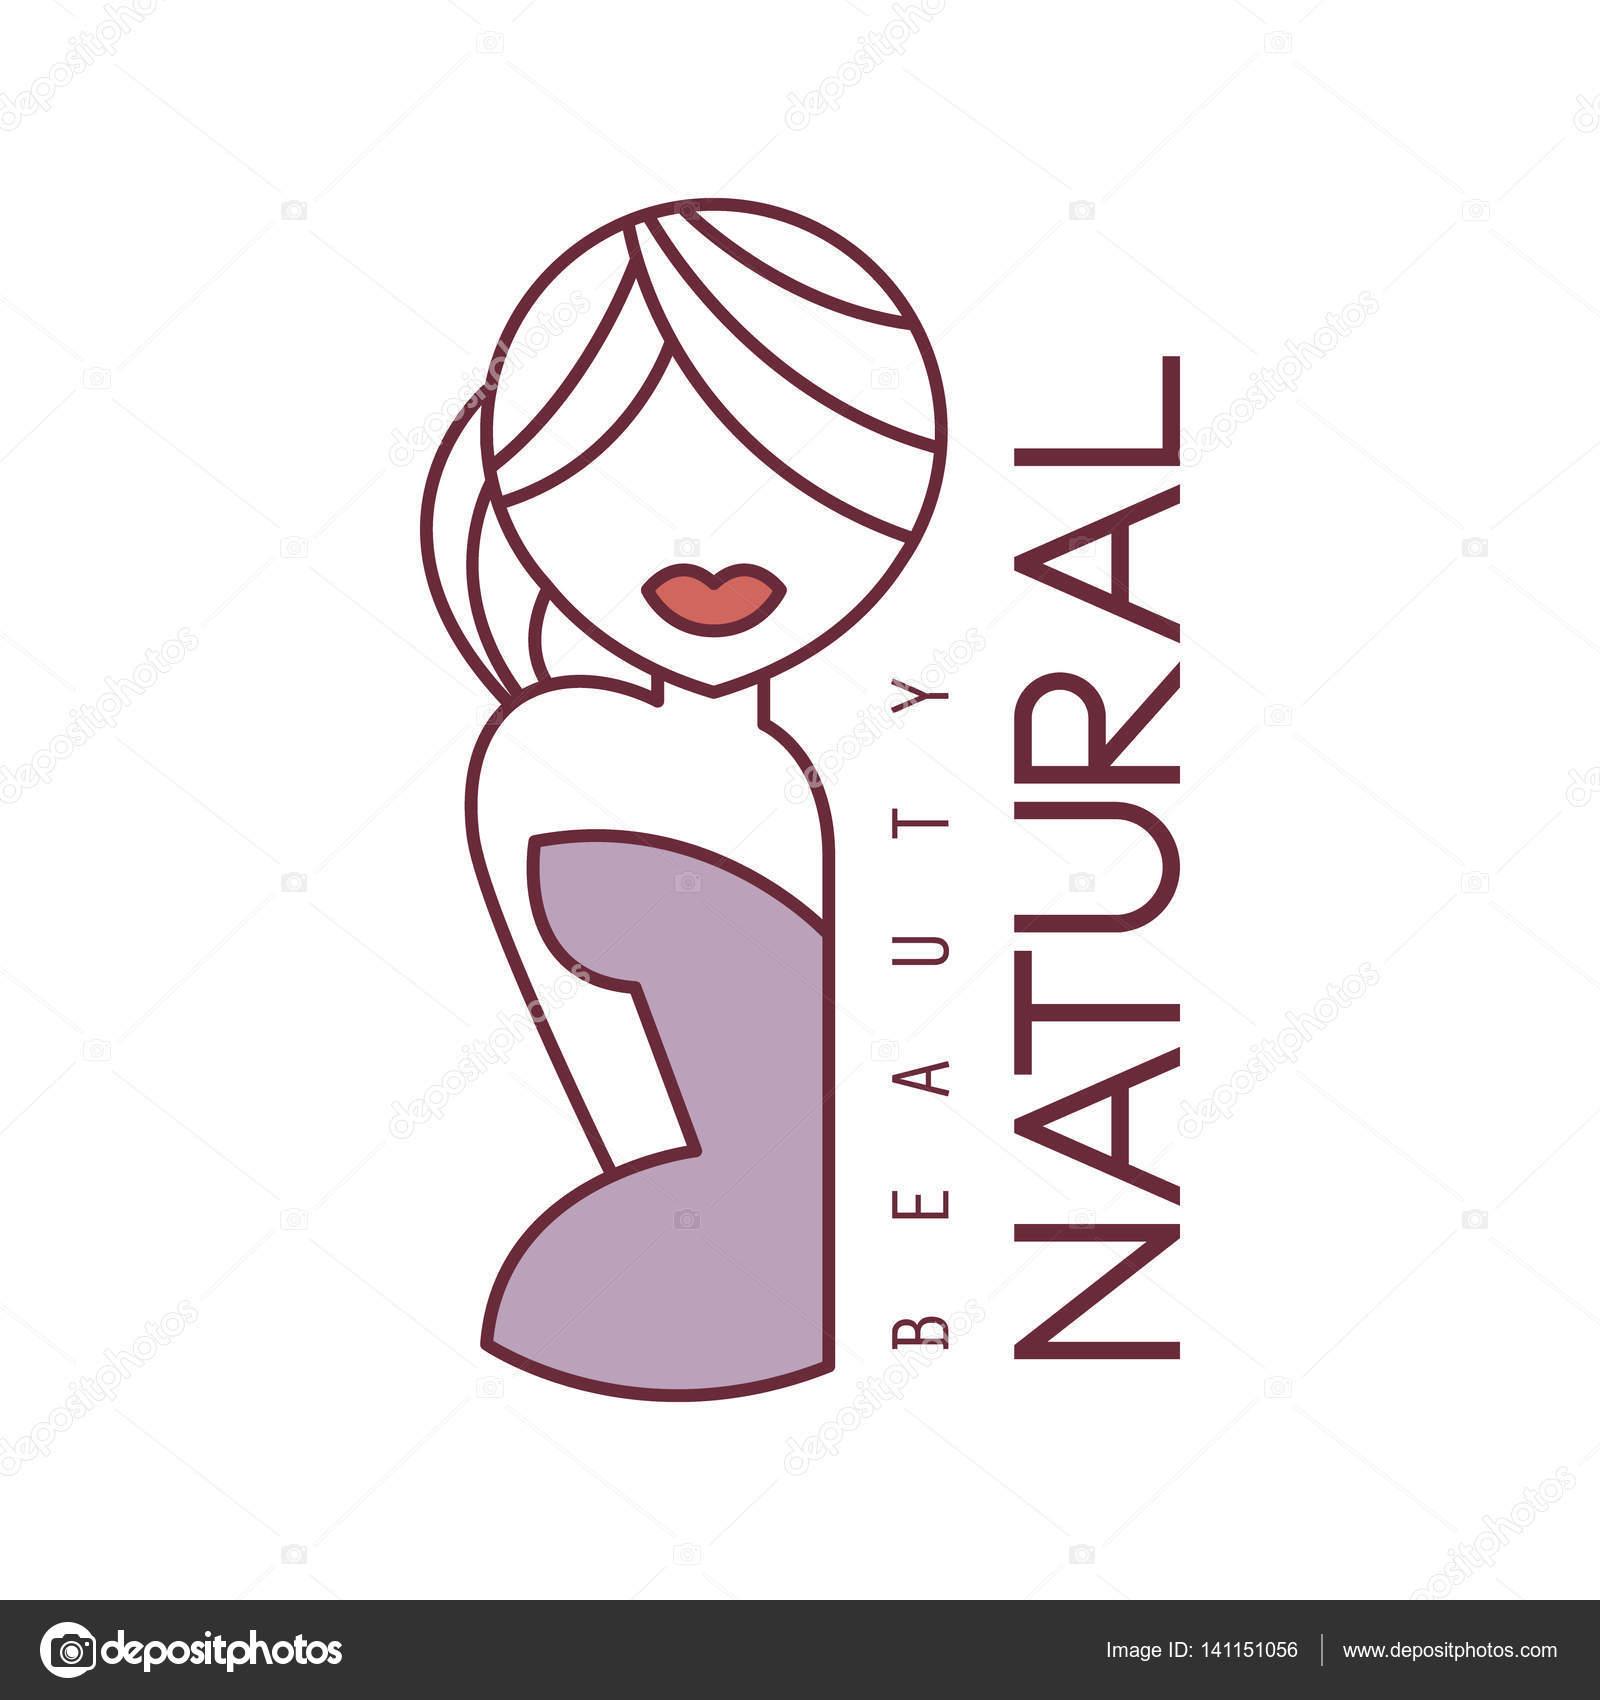 Drawn smile half Natural Half Drawn Outlined Drawn